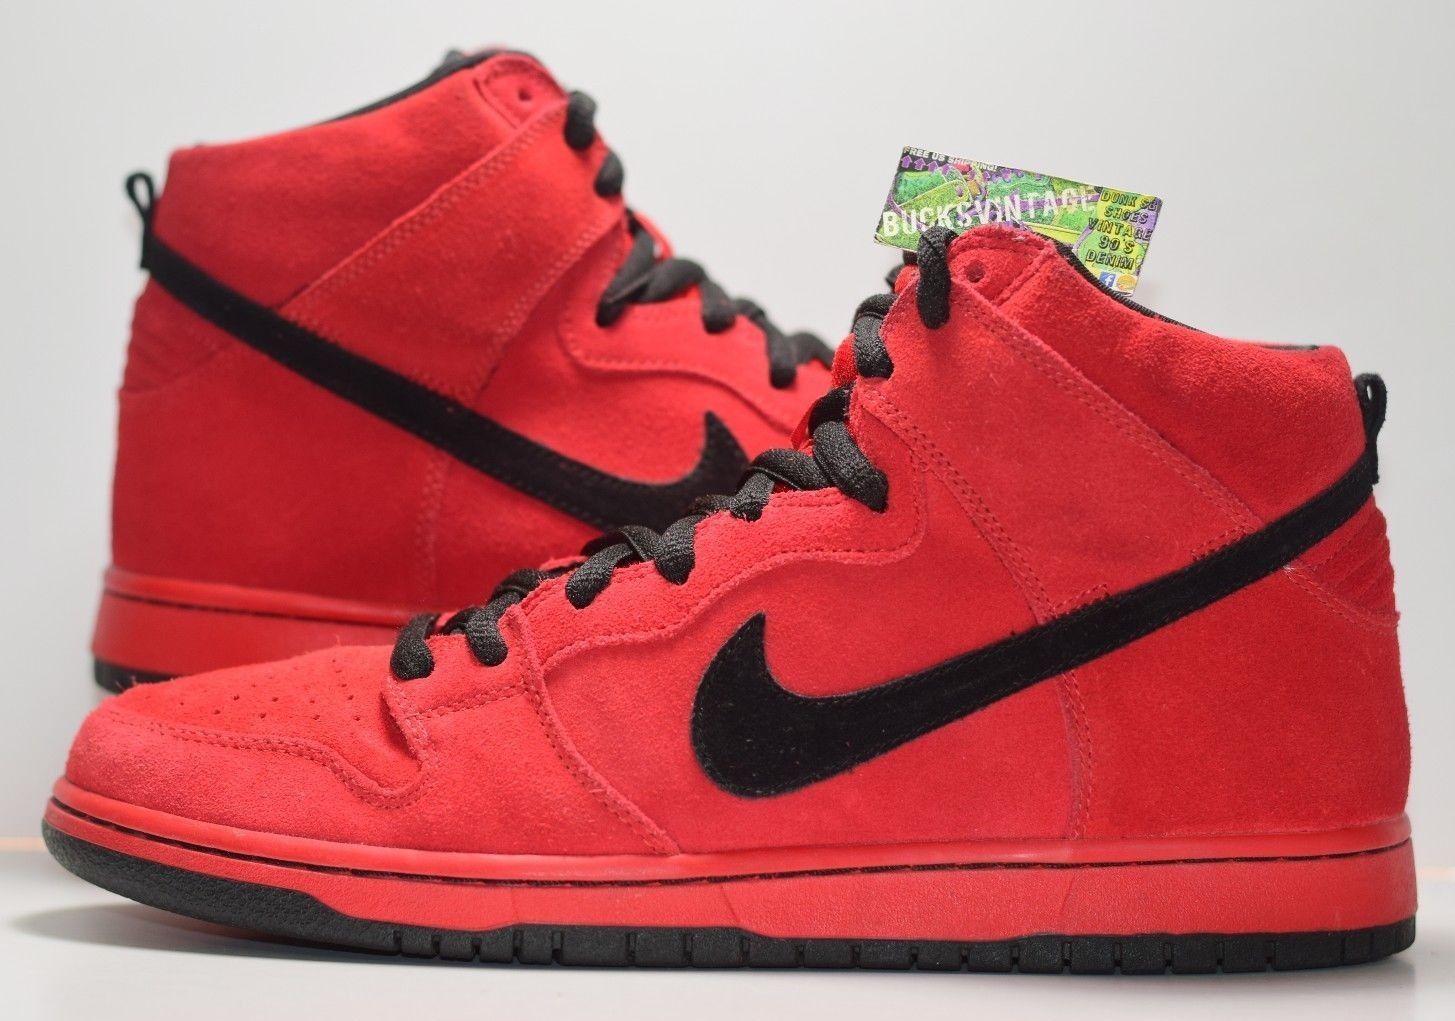 premium selection 24b2f 944f6 Size 10   2011 Nike Dunk SB Red Devil High 305050-600 sample og